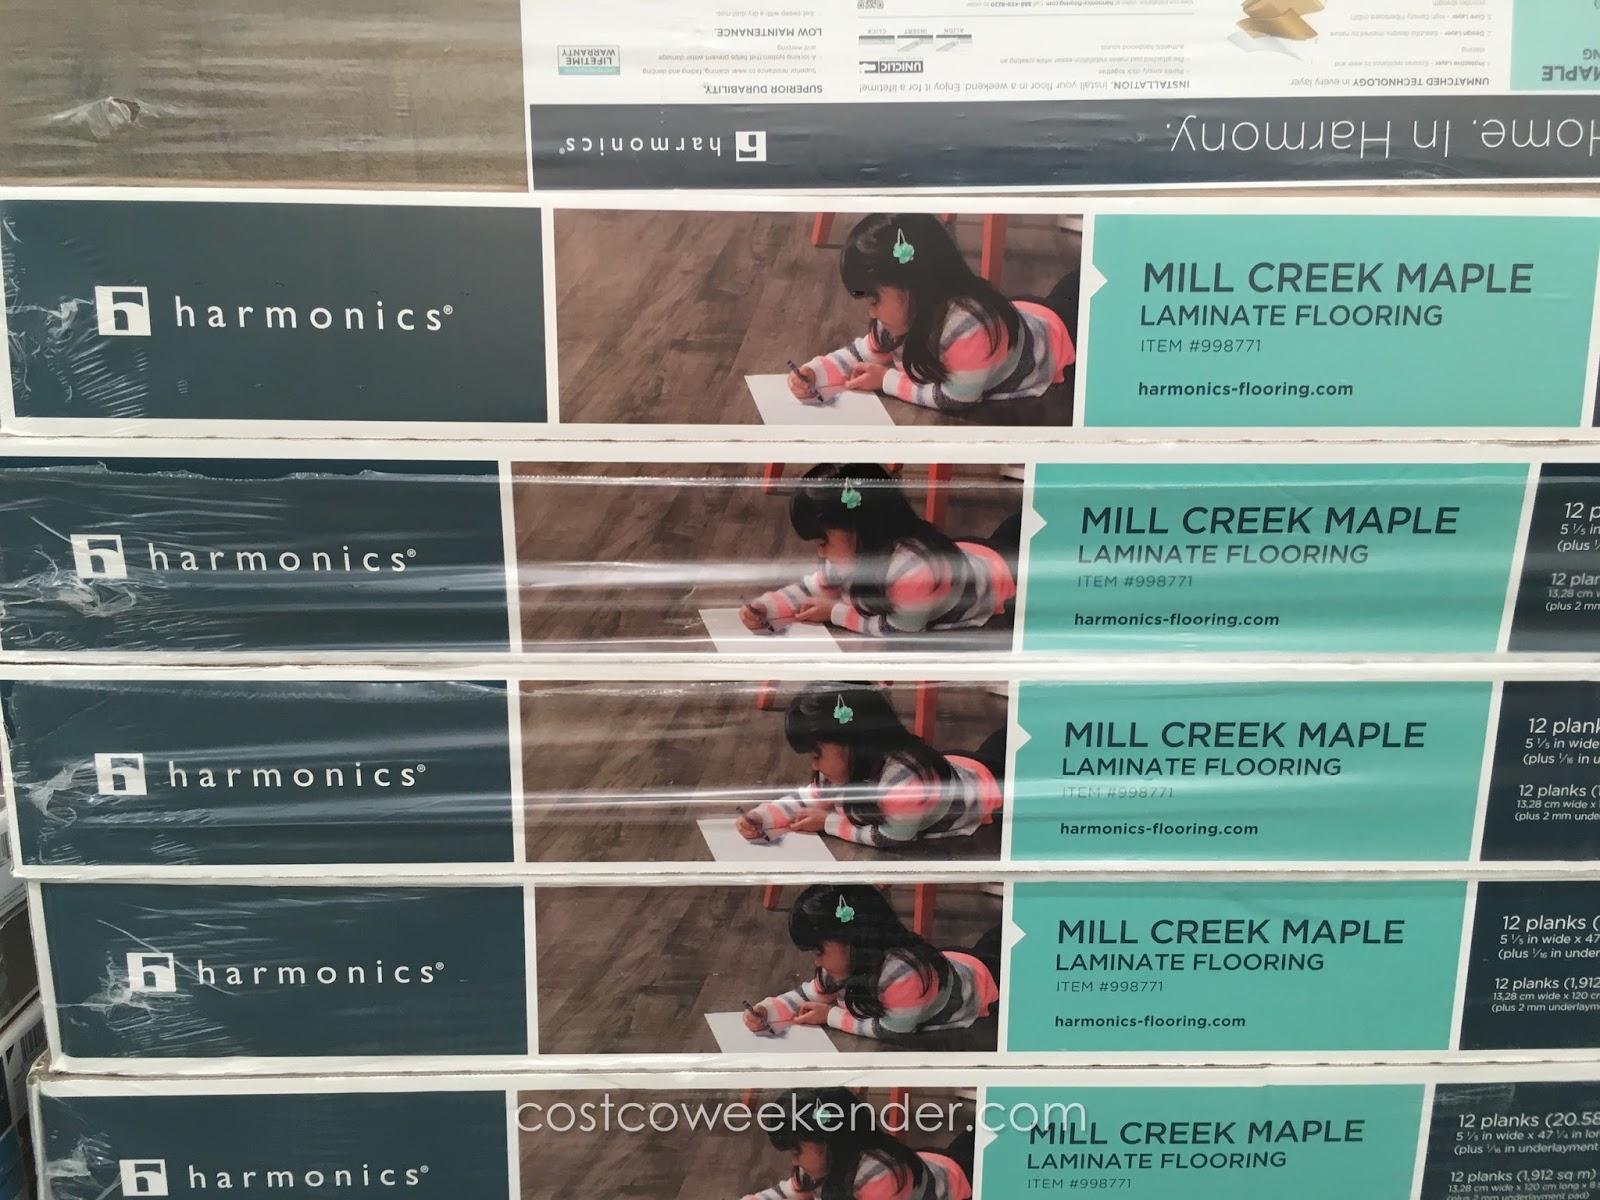 Harmonics Unilin Mill Creek Maple Laminate Flooring